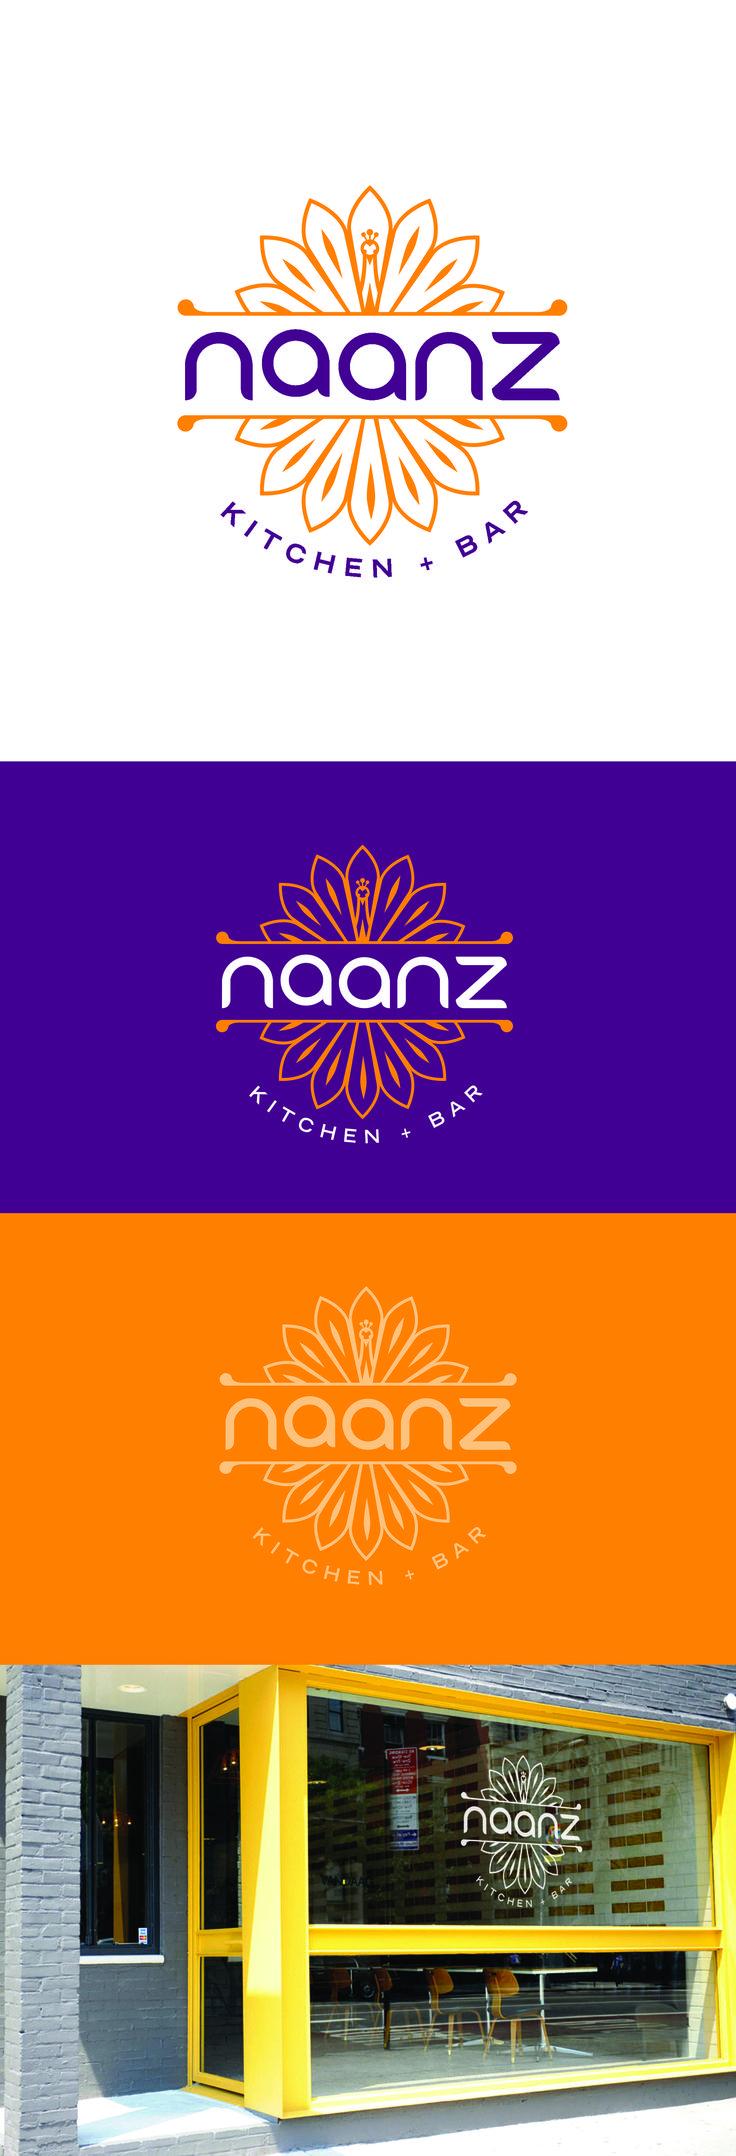 concept for a trendy Indian restaurant designed by Vishal Cabral